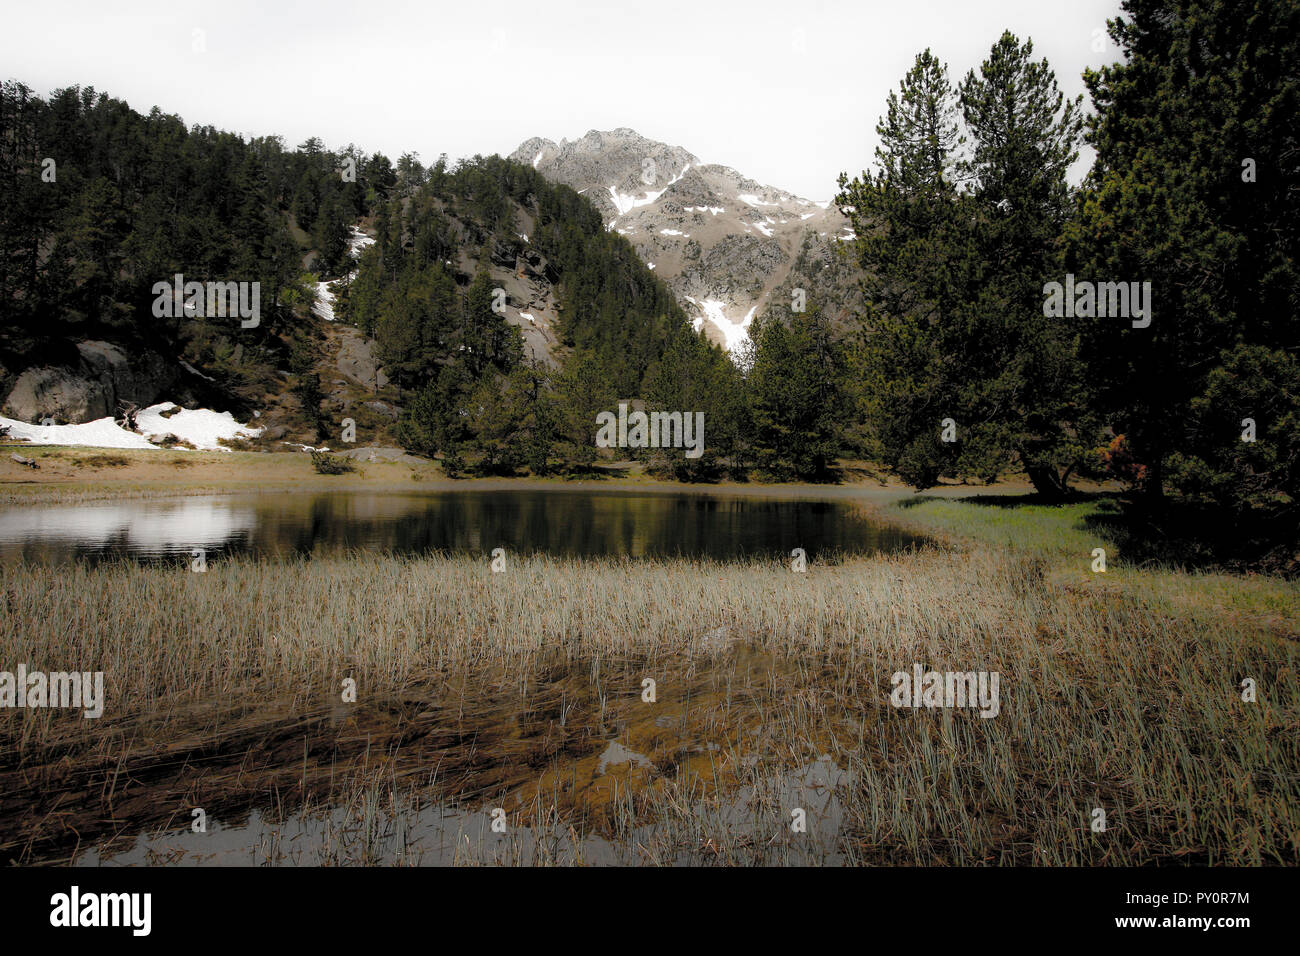 Banhs de Tredos. Pyrenees. Lleida, Catalonia. Spain - Stock Image